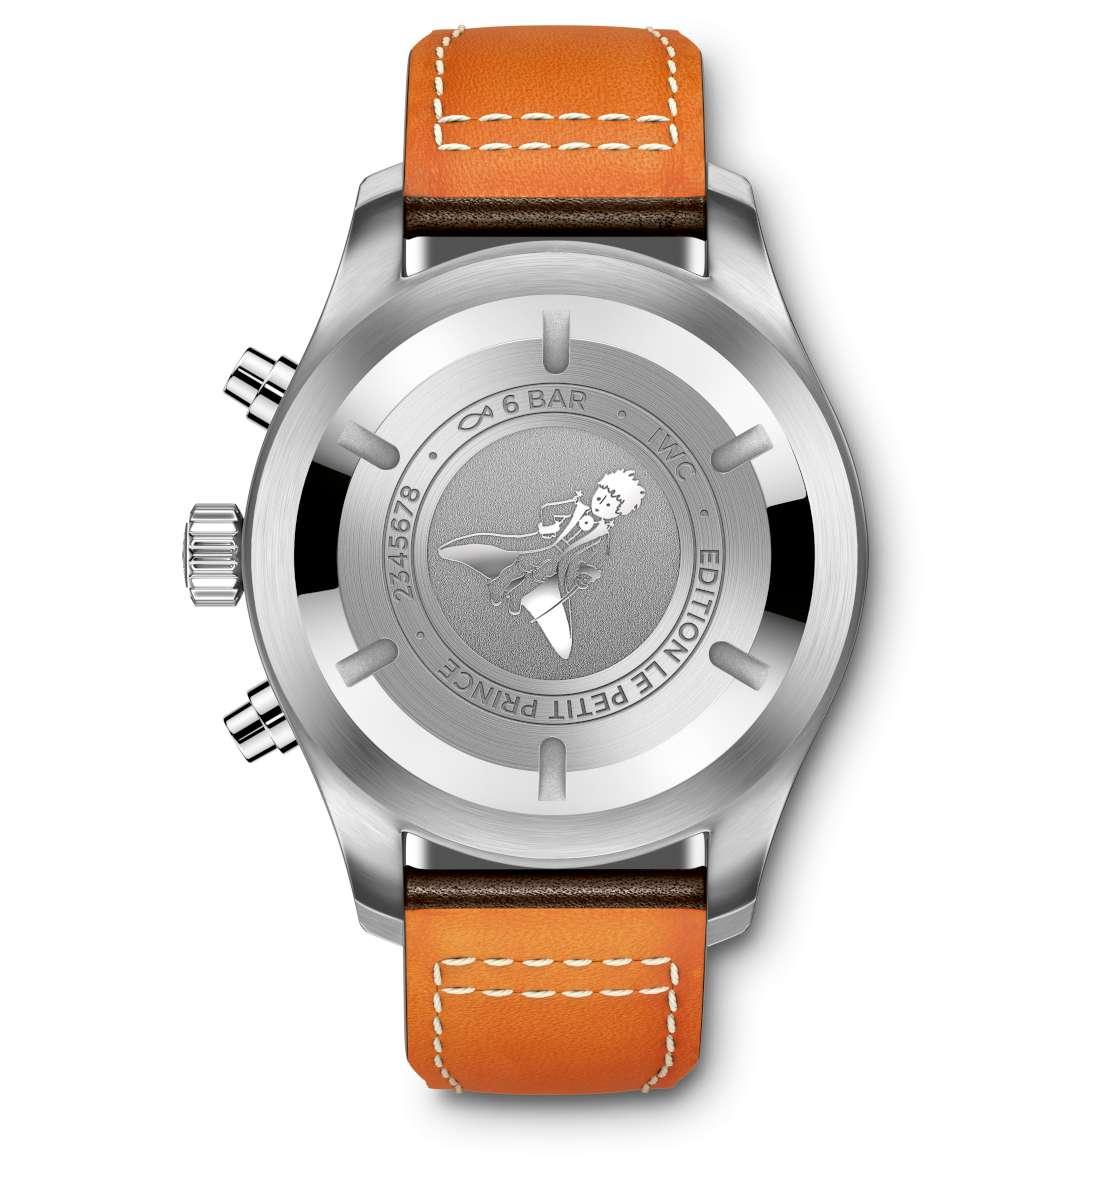 IWC Pilot's Watch Chronograph IW377714